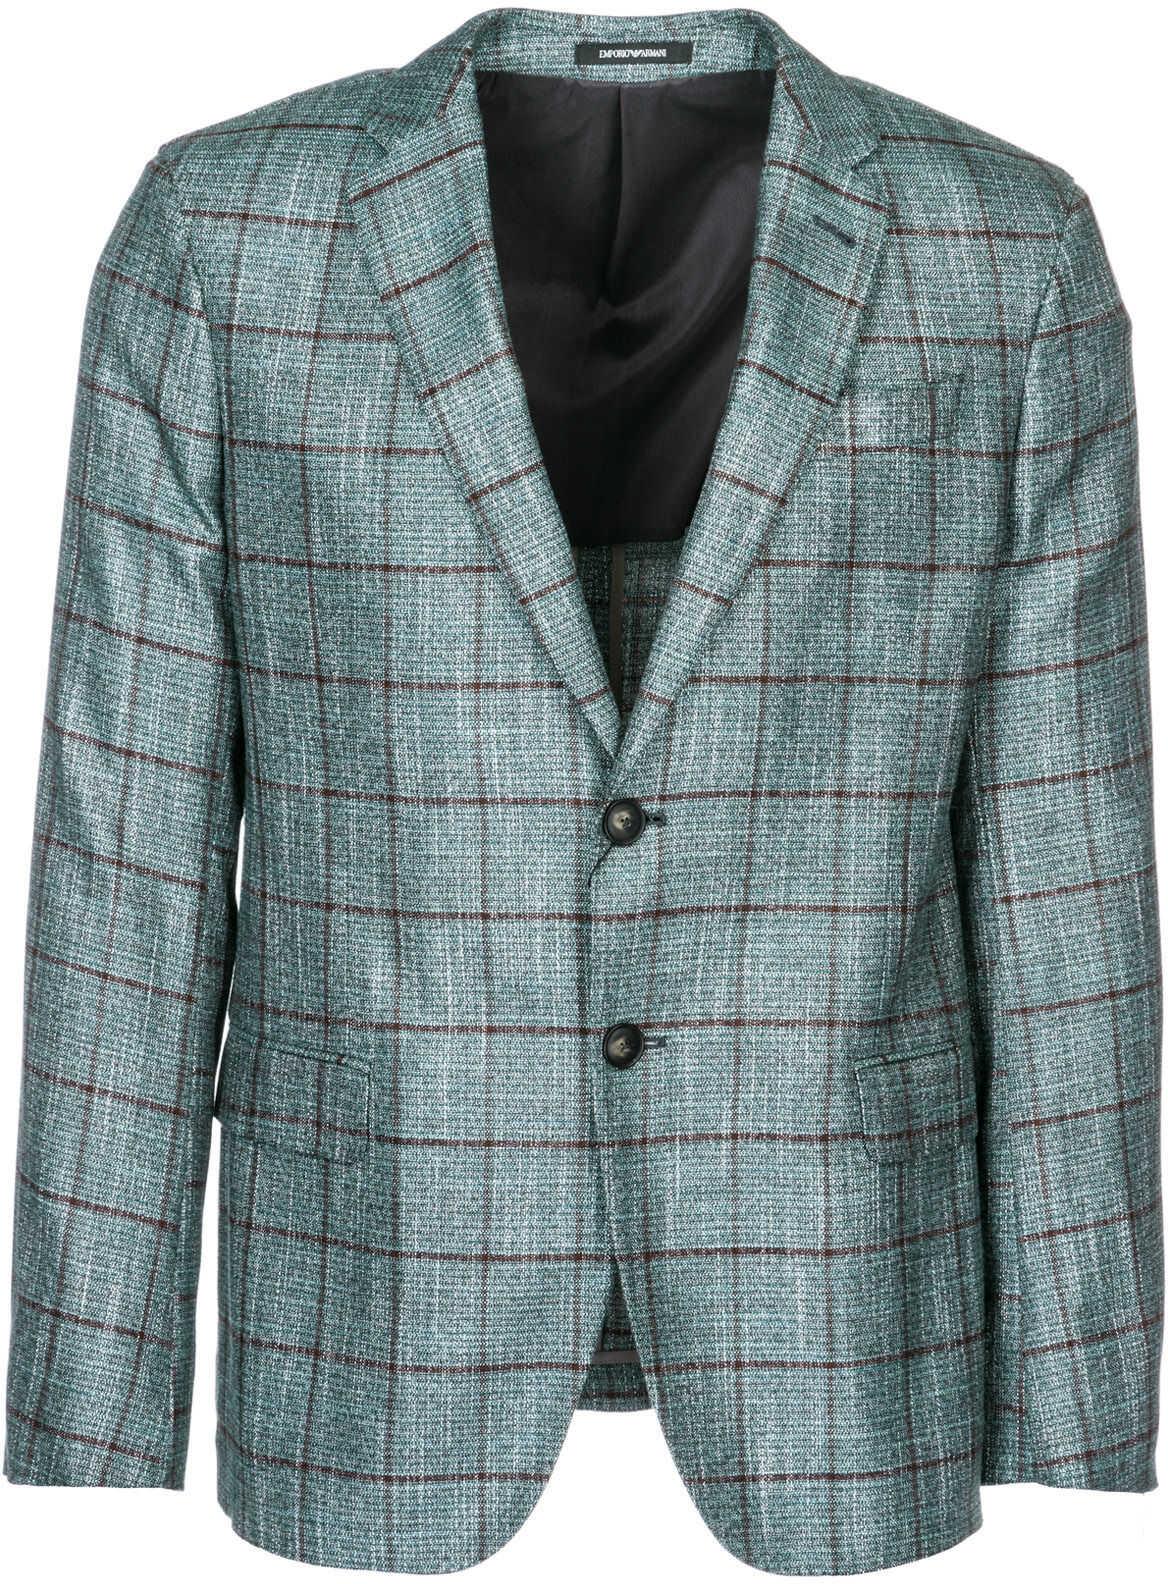 Emporio Armani Jacket Blazer Green